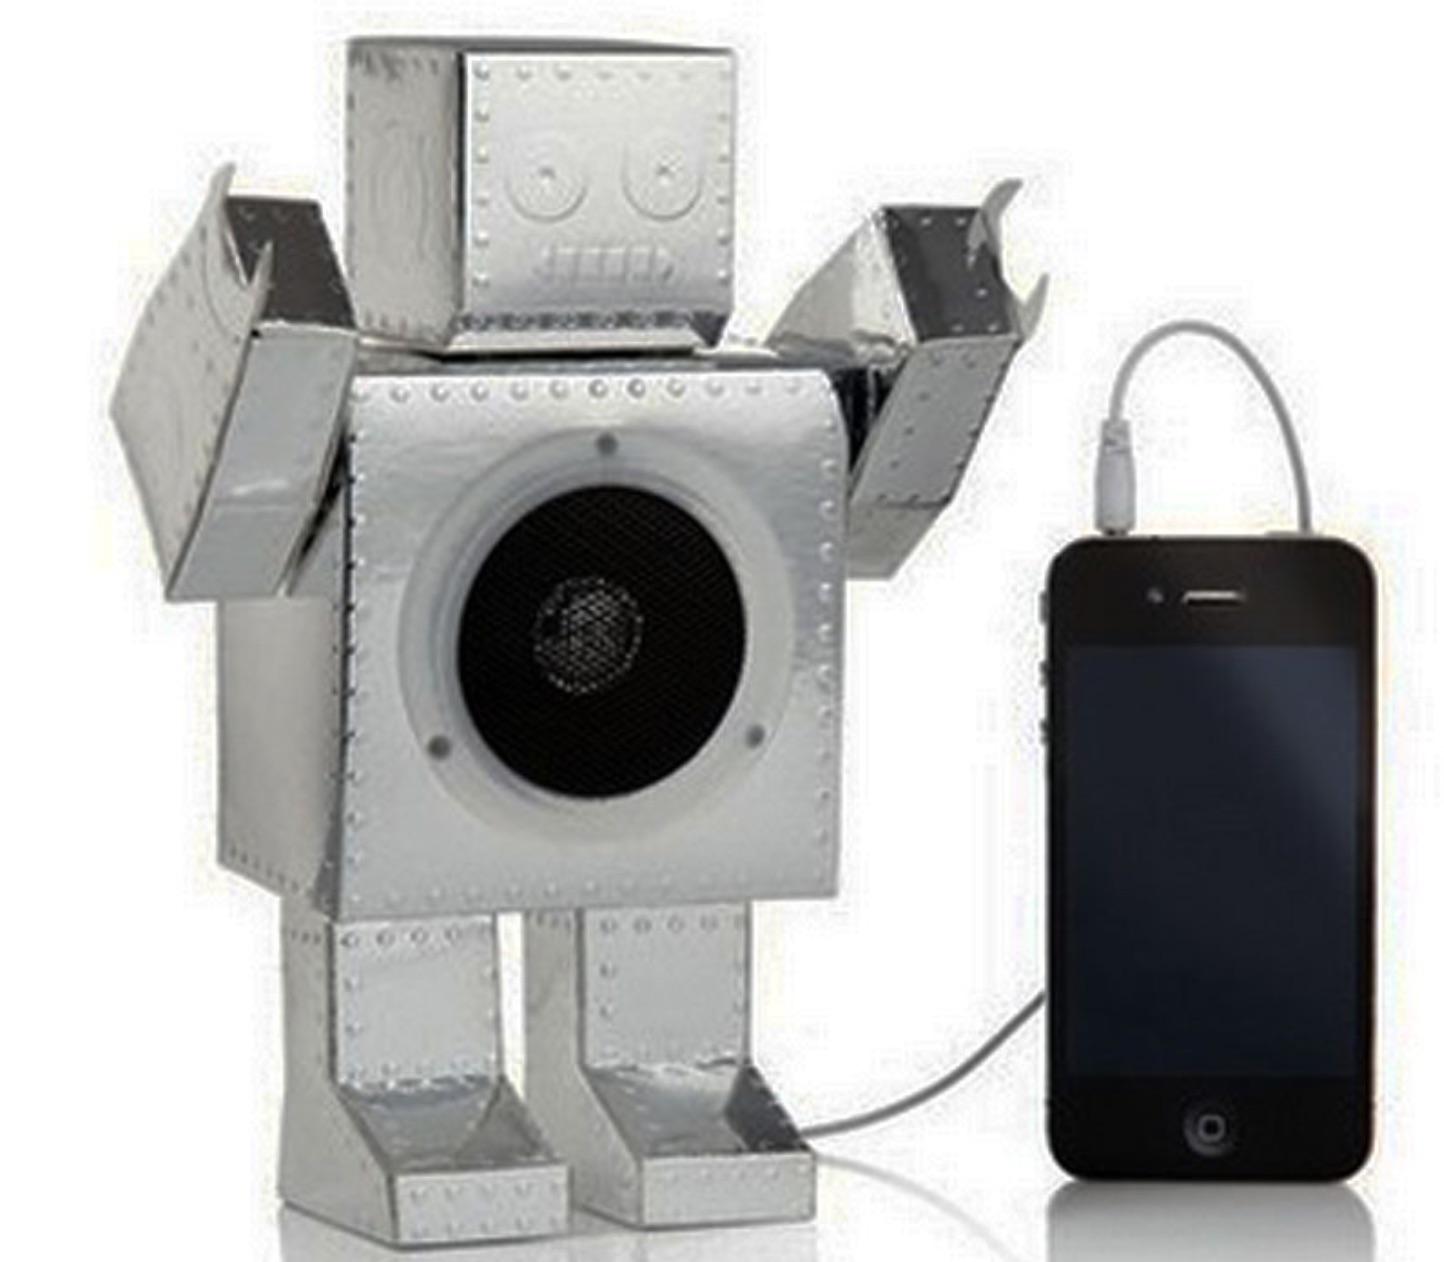 beat_box_flat_pack_robot_speaker_cubeme1_jpg_1_000x779_pixels